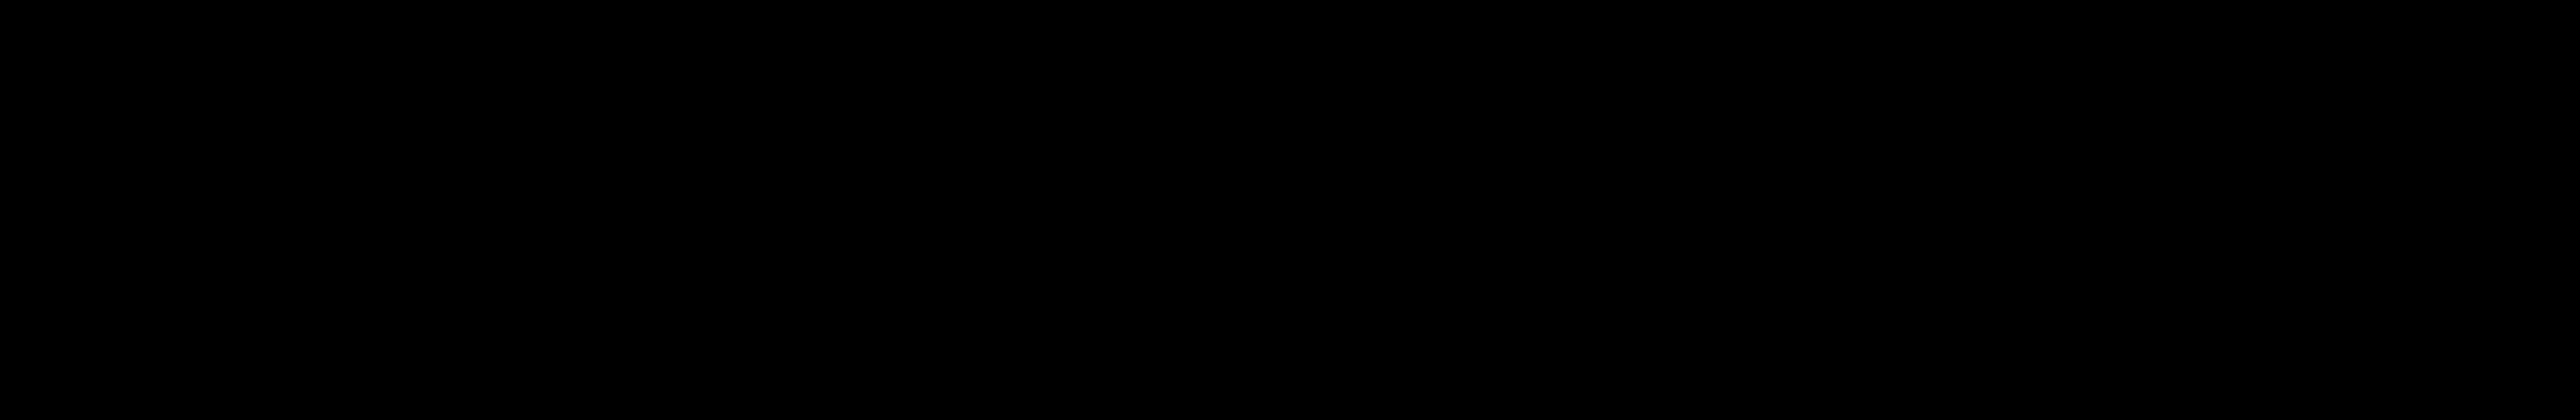 Sysmoqmod